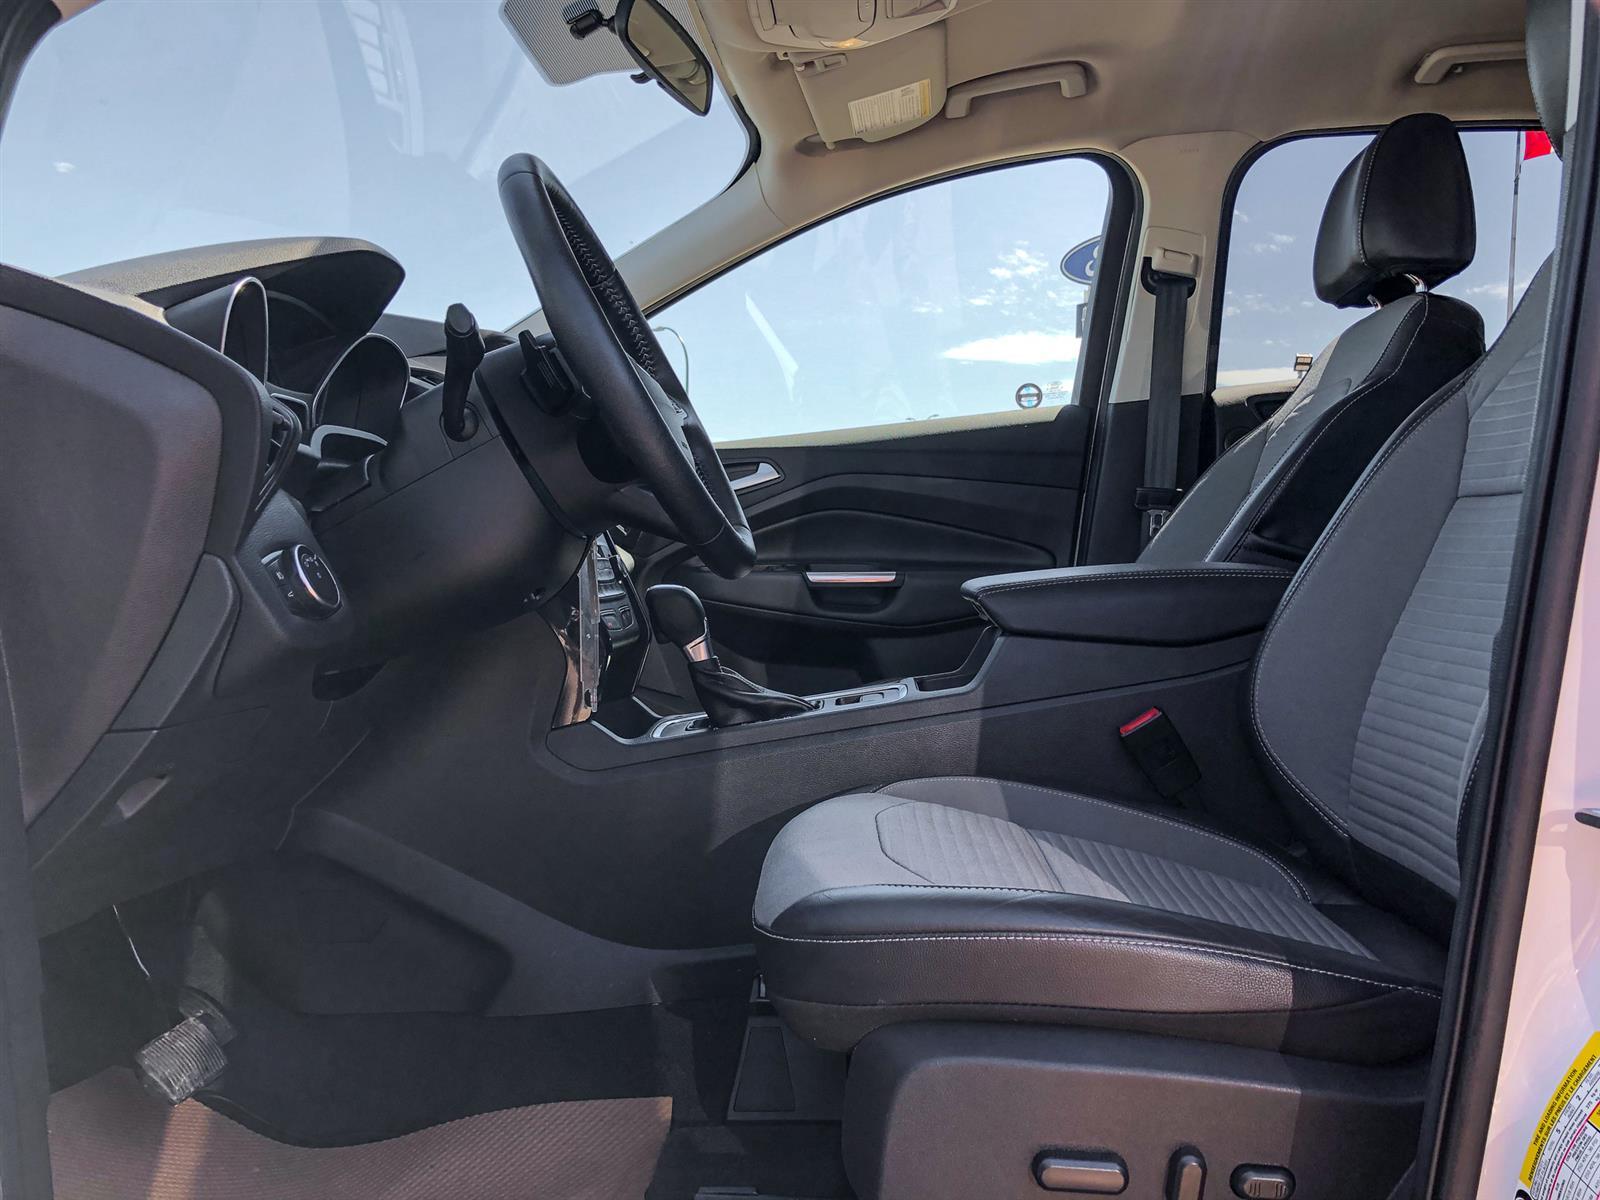 2017 Ford Escape SE | 2.0L ECOBOOST | 4WD | REVERSE CAMERA | TOUCH SCREEN NAV